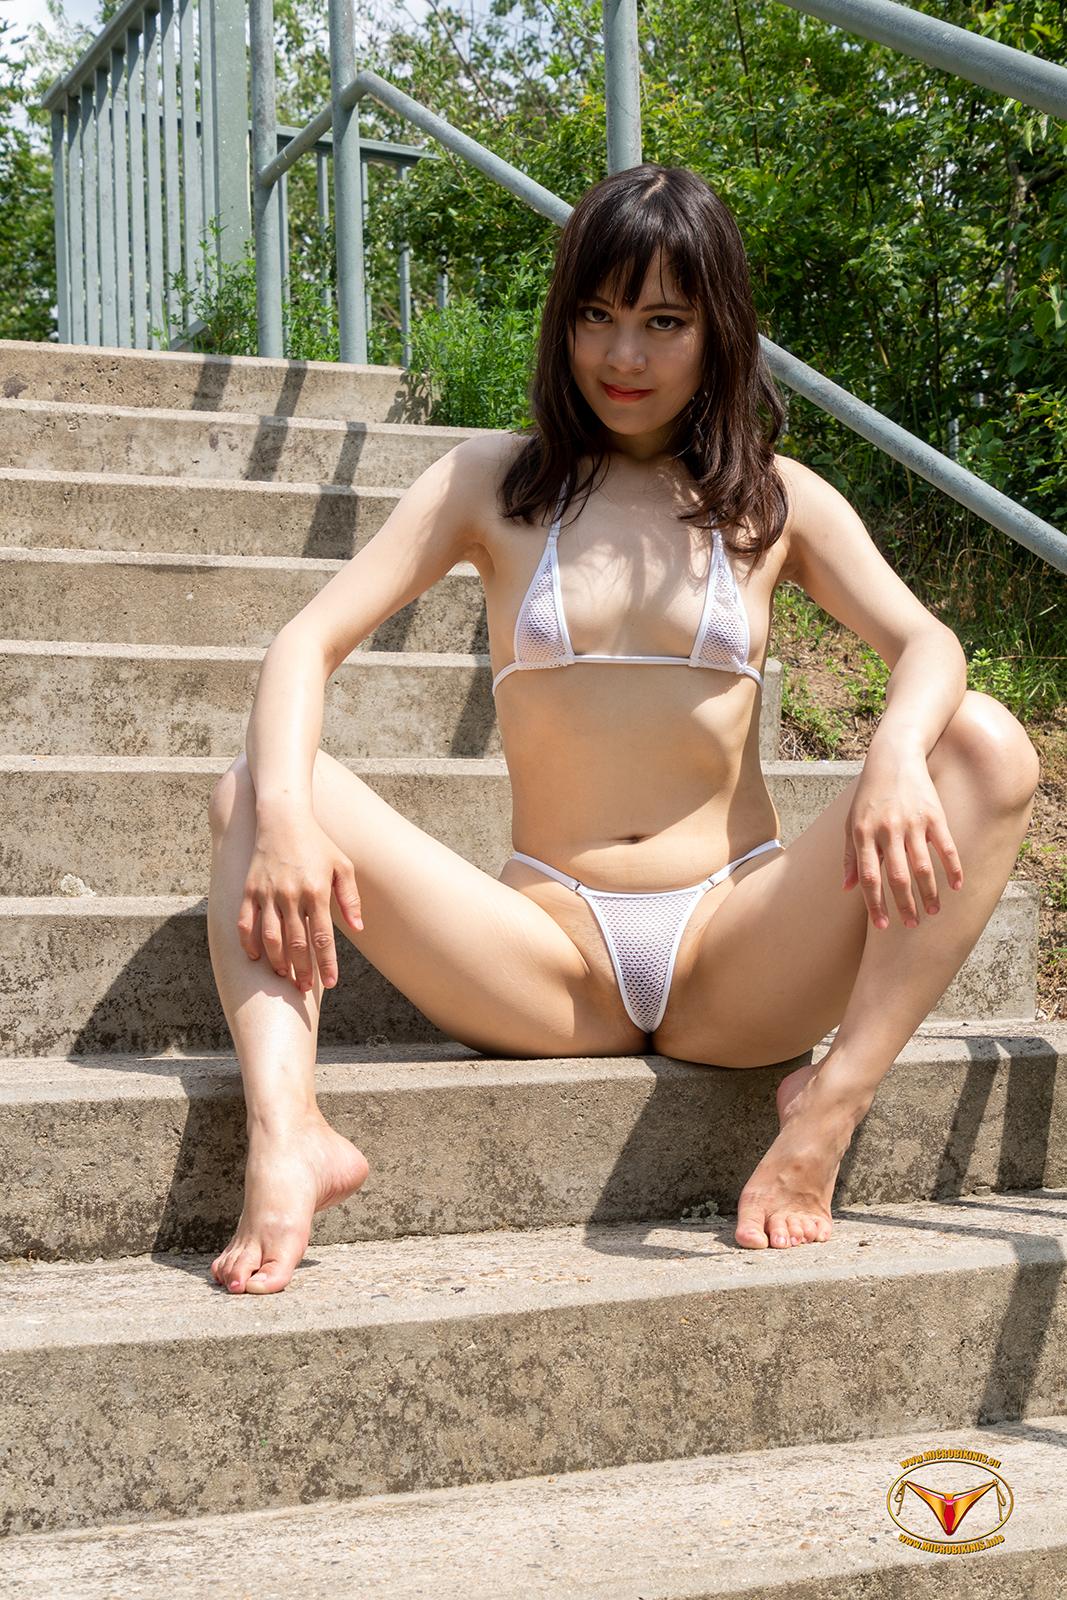 Microbikinis Bikinigirl, Micro Bikini Model Yuli Hung Bikinigirl from Vietnam